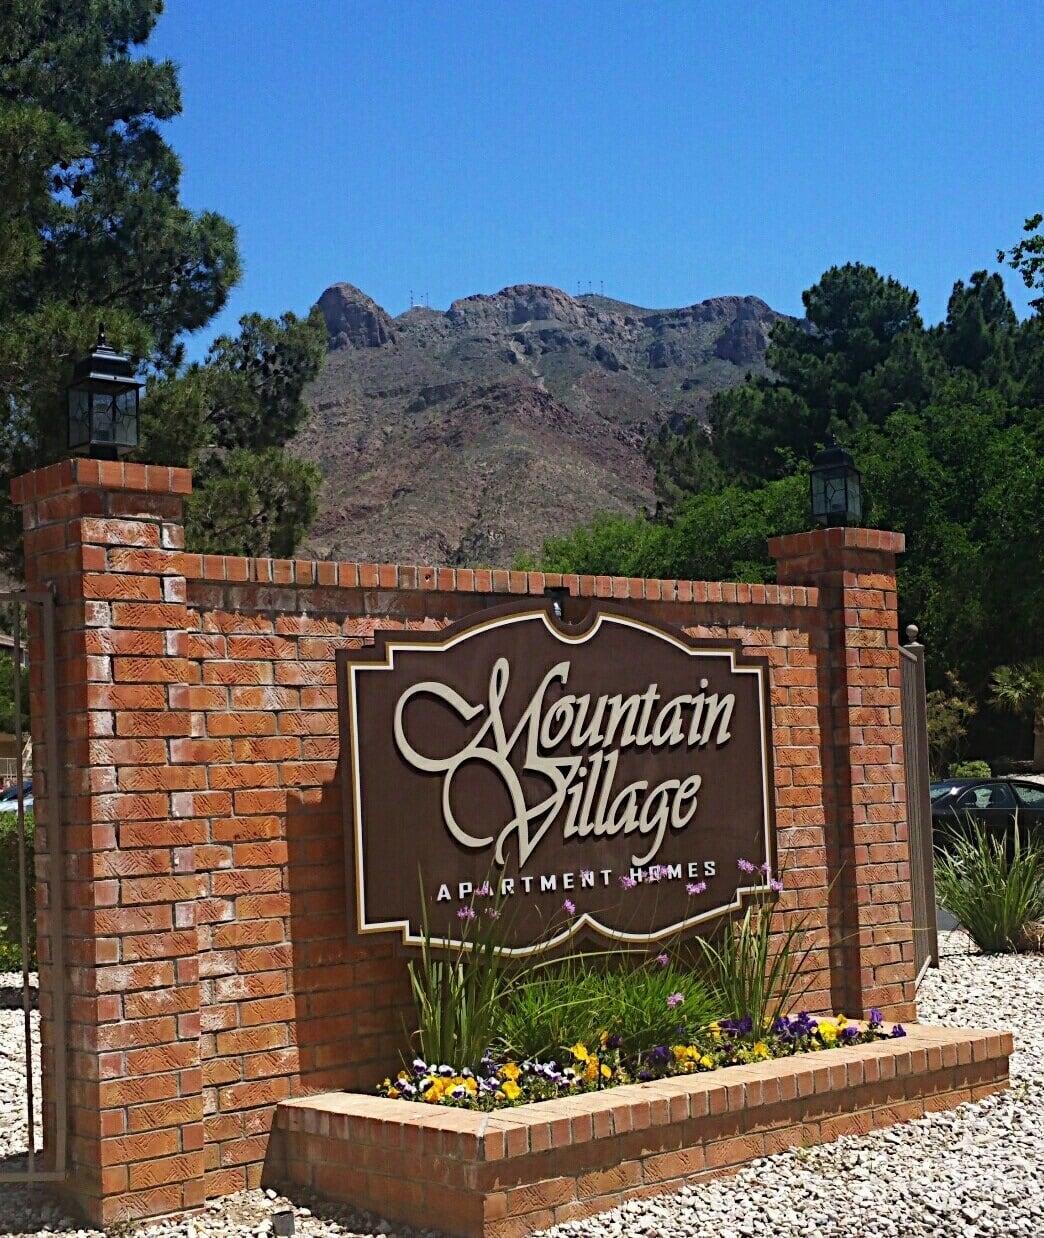 Sign for El Paso apartments